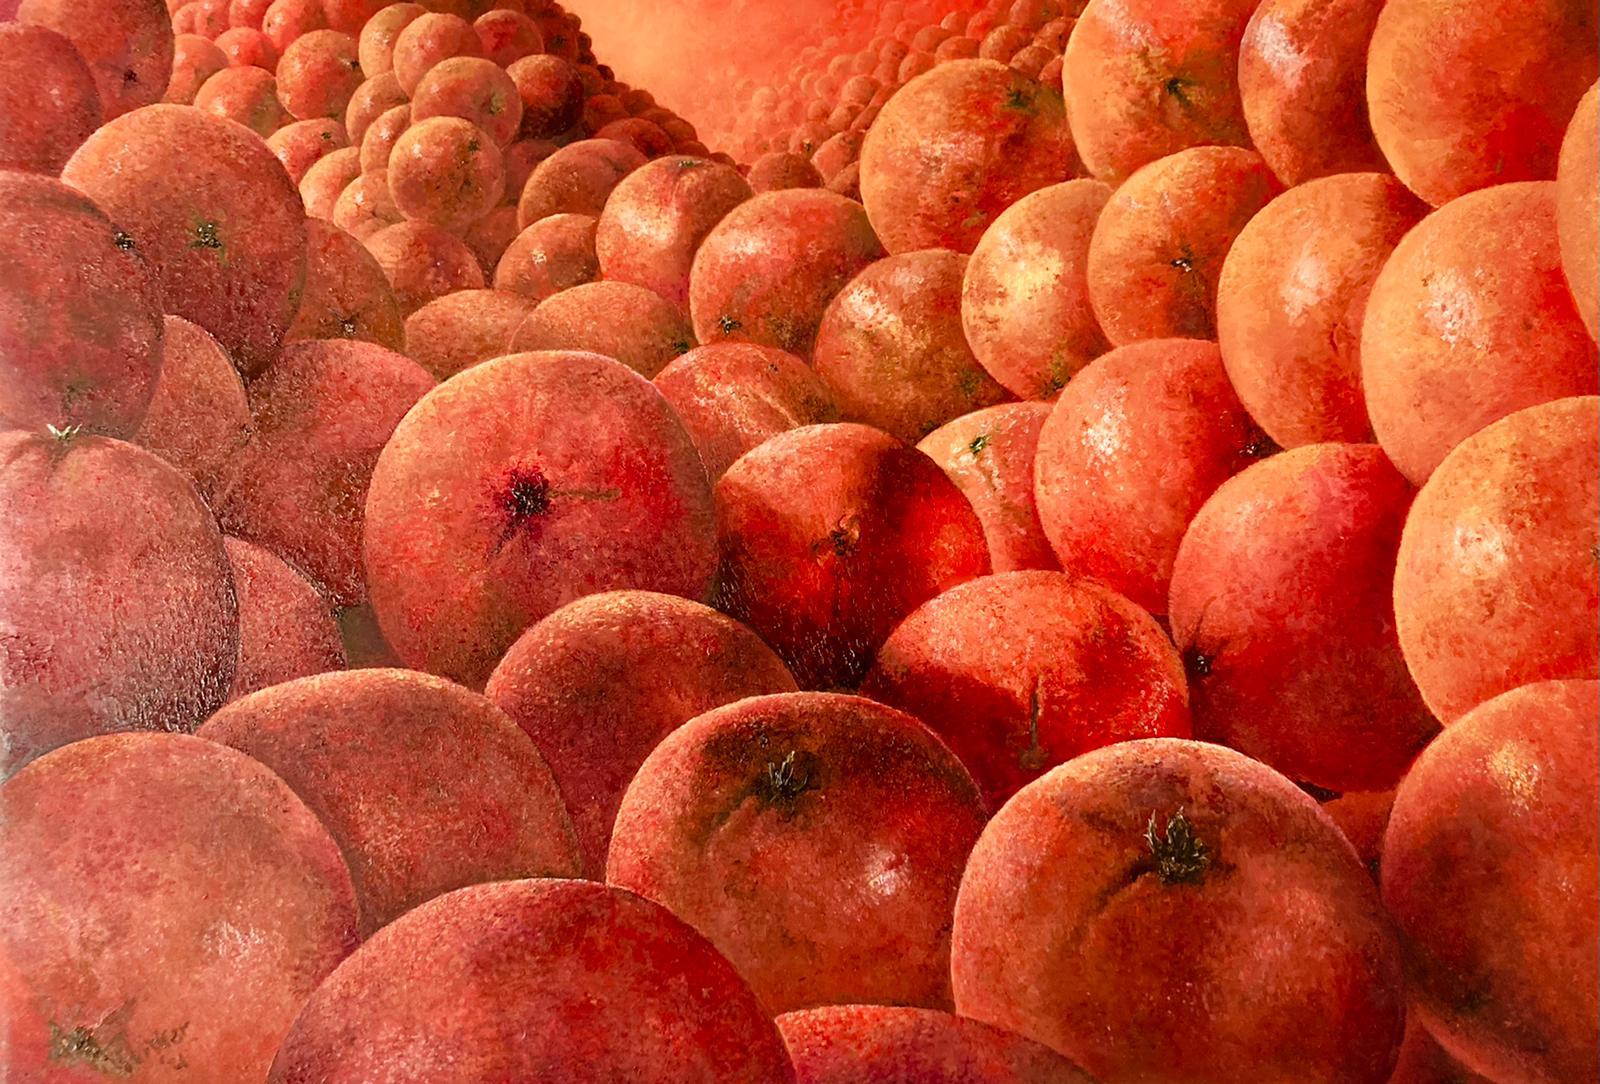 One day we will be more like oranges_Rene Visker